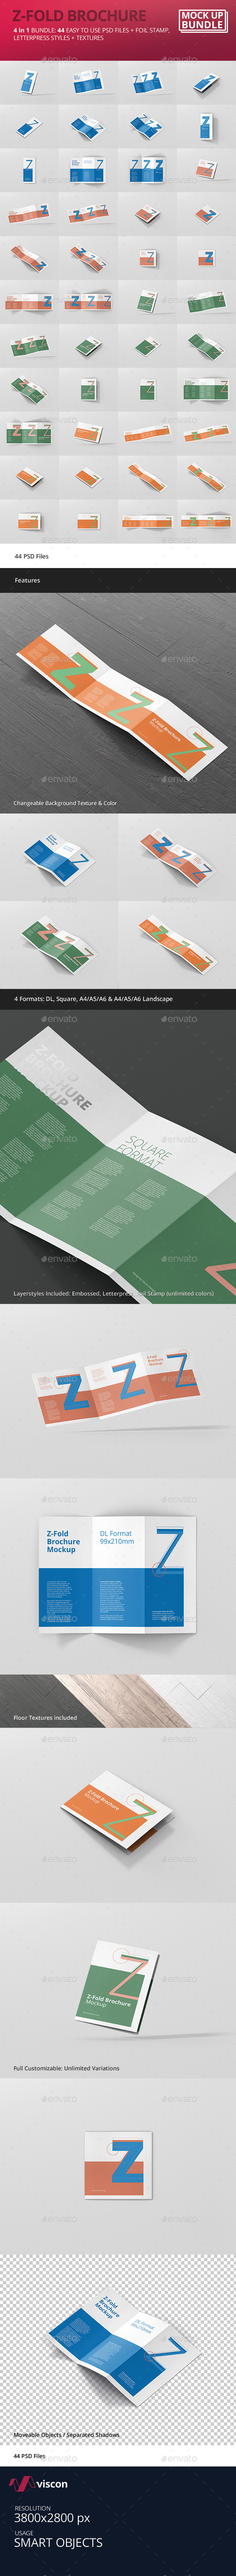 Z-Fold Brochure Mockup Bundle - Brochures Print